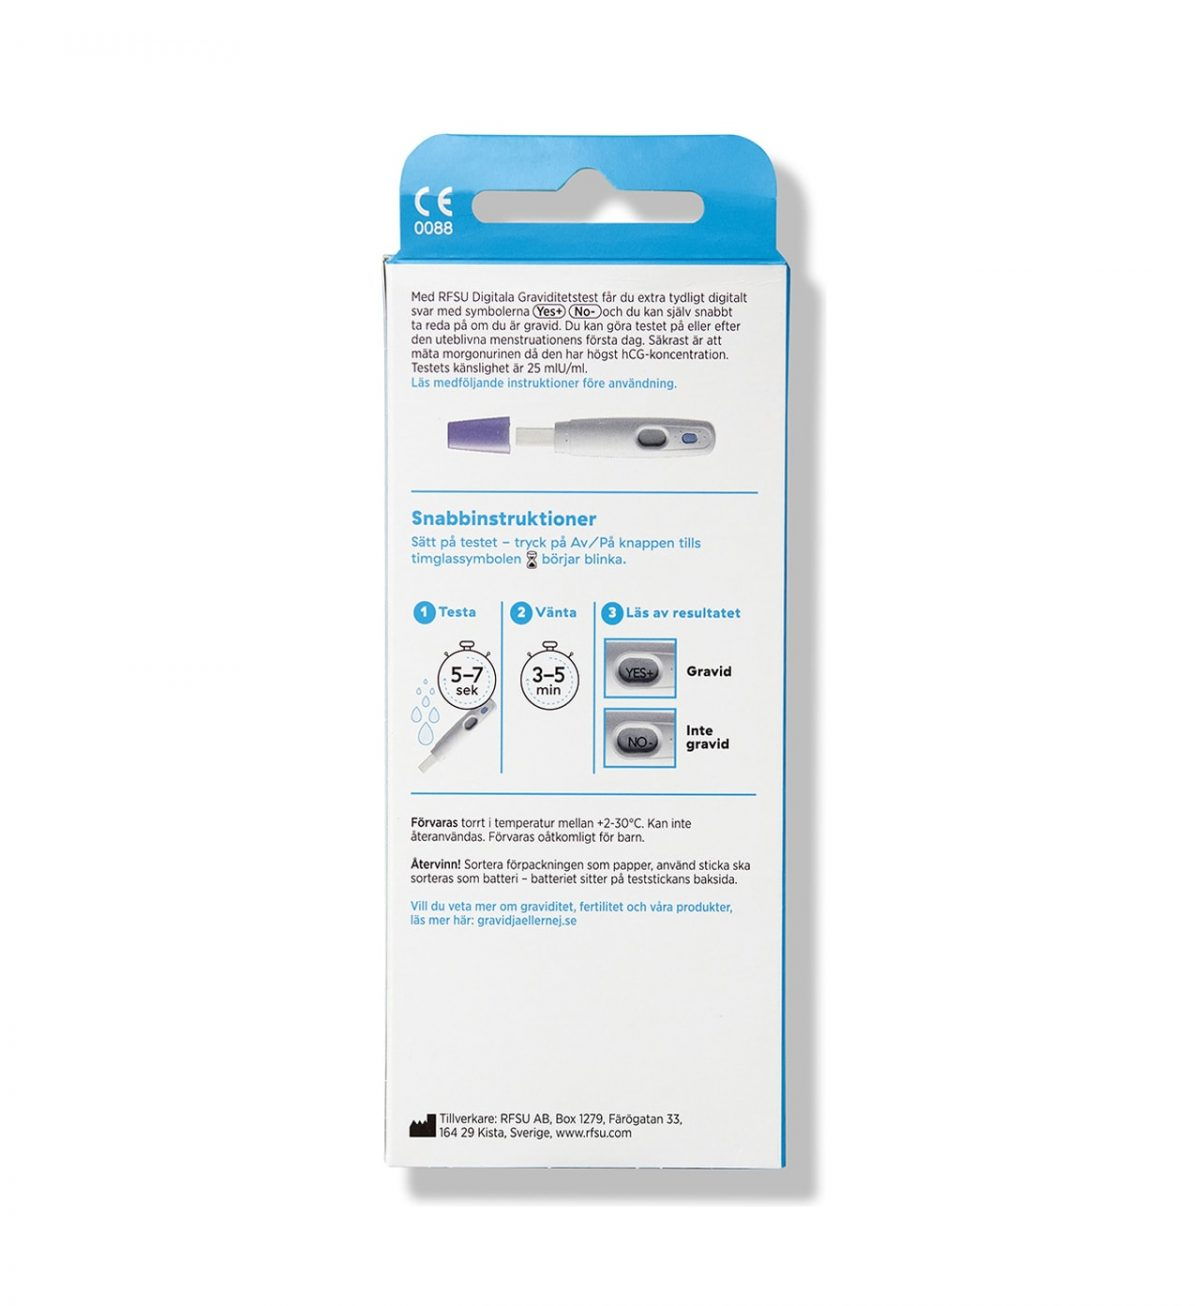 digitalt graviditetstest 1p rfsu